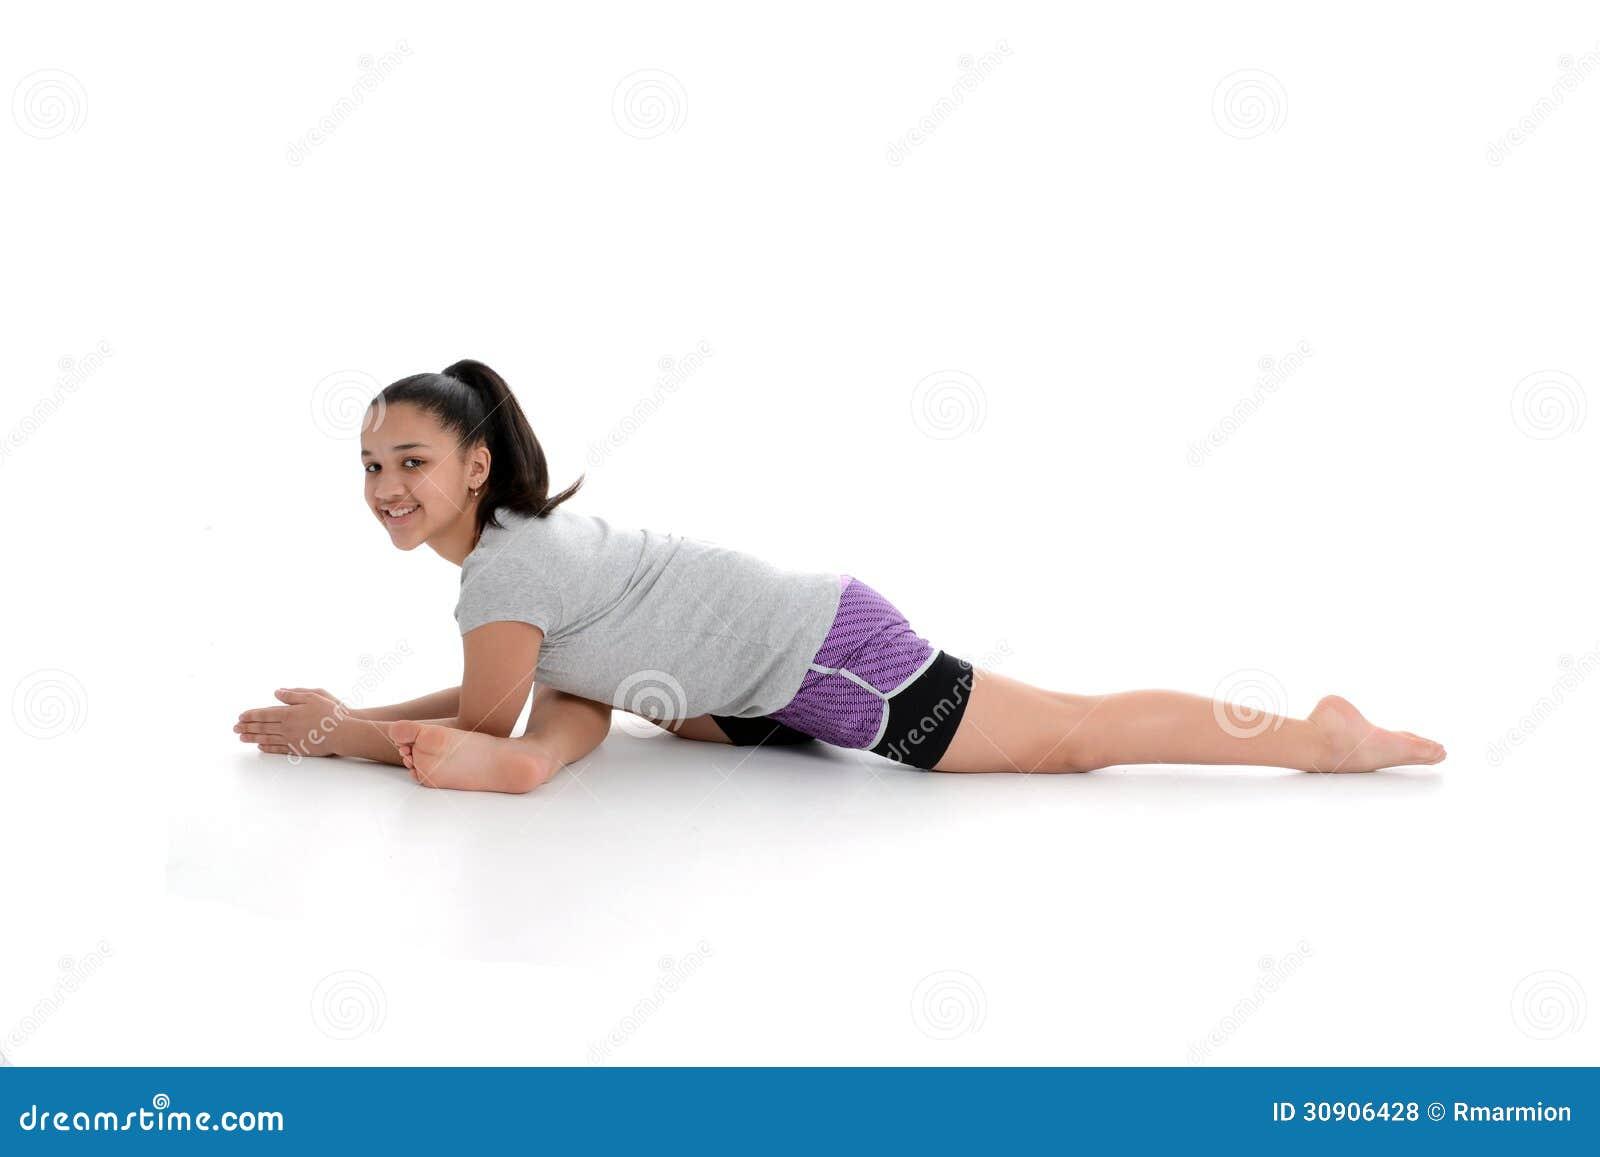 Girl In Yoga Pose Royalty Free Stock Photos - Image: 30906428